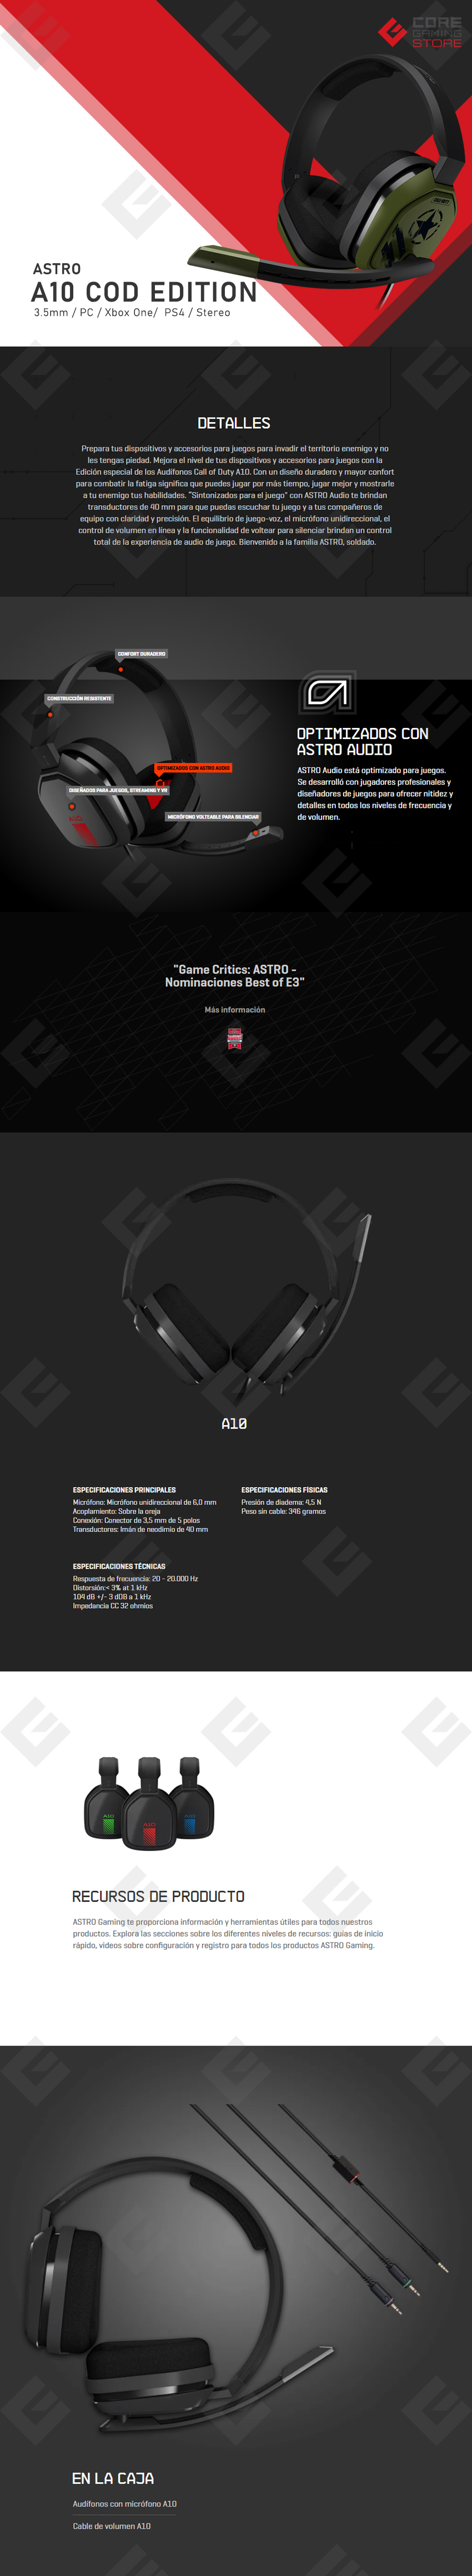 Diadema Astro A10 Edicion Call Of Duty, Alambrico, 3.5mm, Xbox One, PS4, Mobile Devices (Logitech)